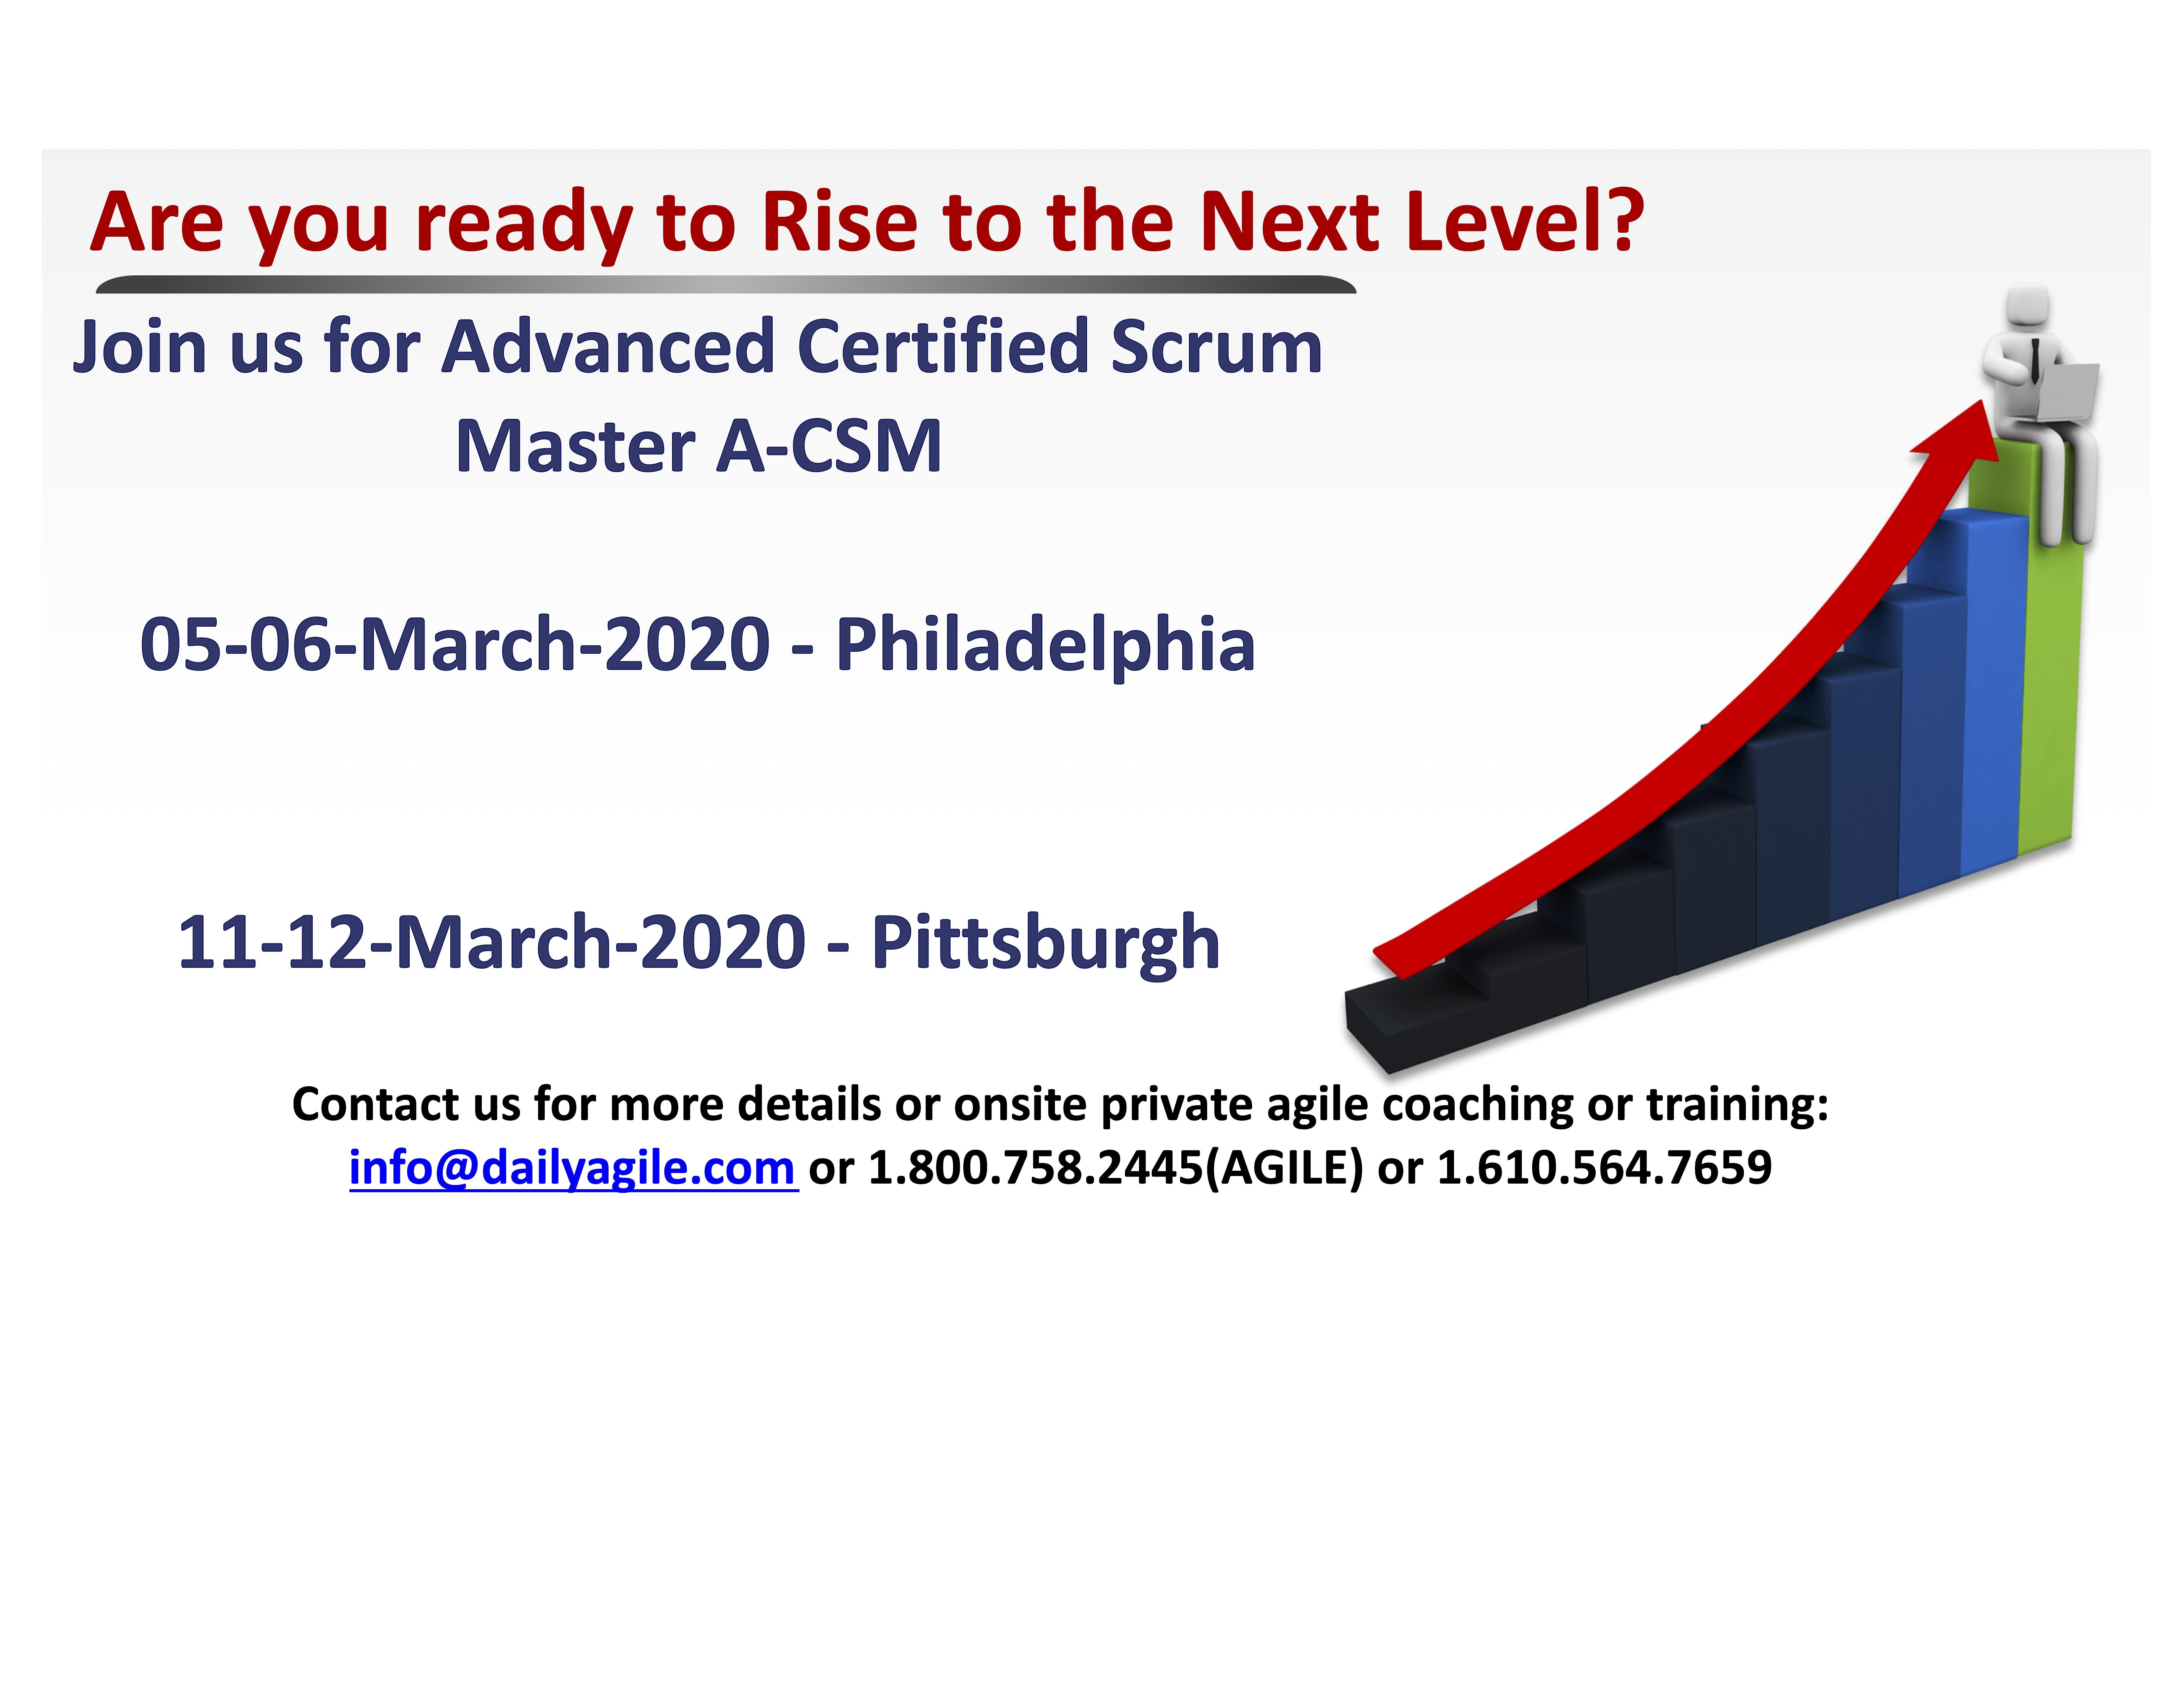 Advanced Certified Scrum Master (A-CSM) in Malvern/Philadelphia, PA